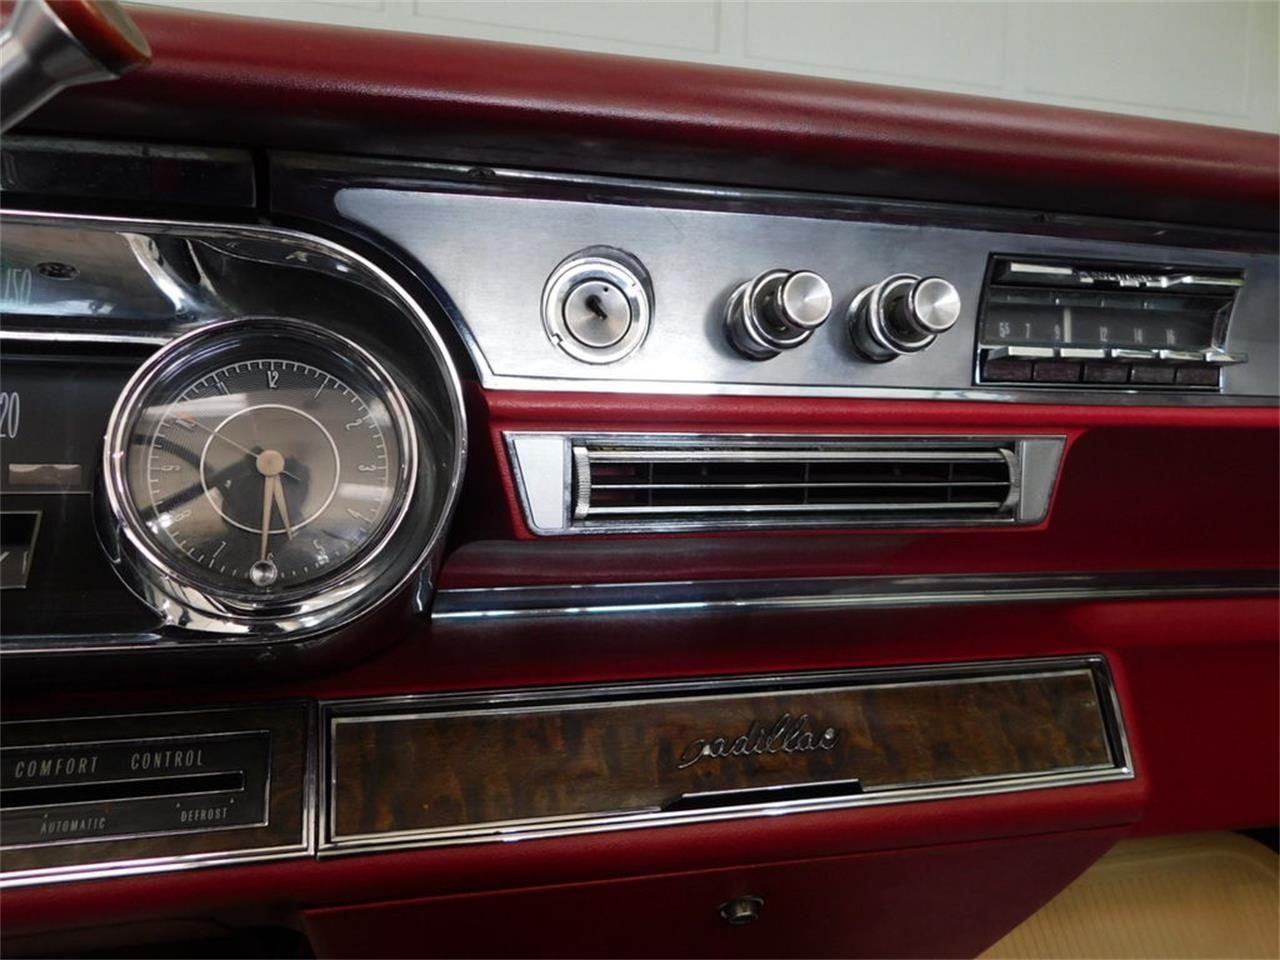 1965 Cadillac Eldorado (CC-1344860) for sale in Hamburg, New York